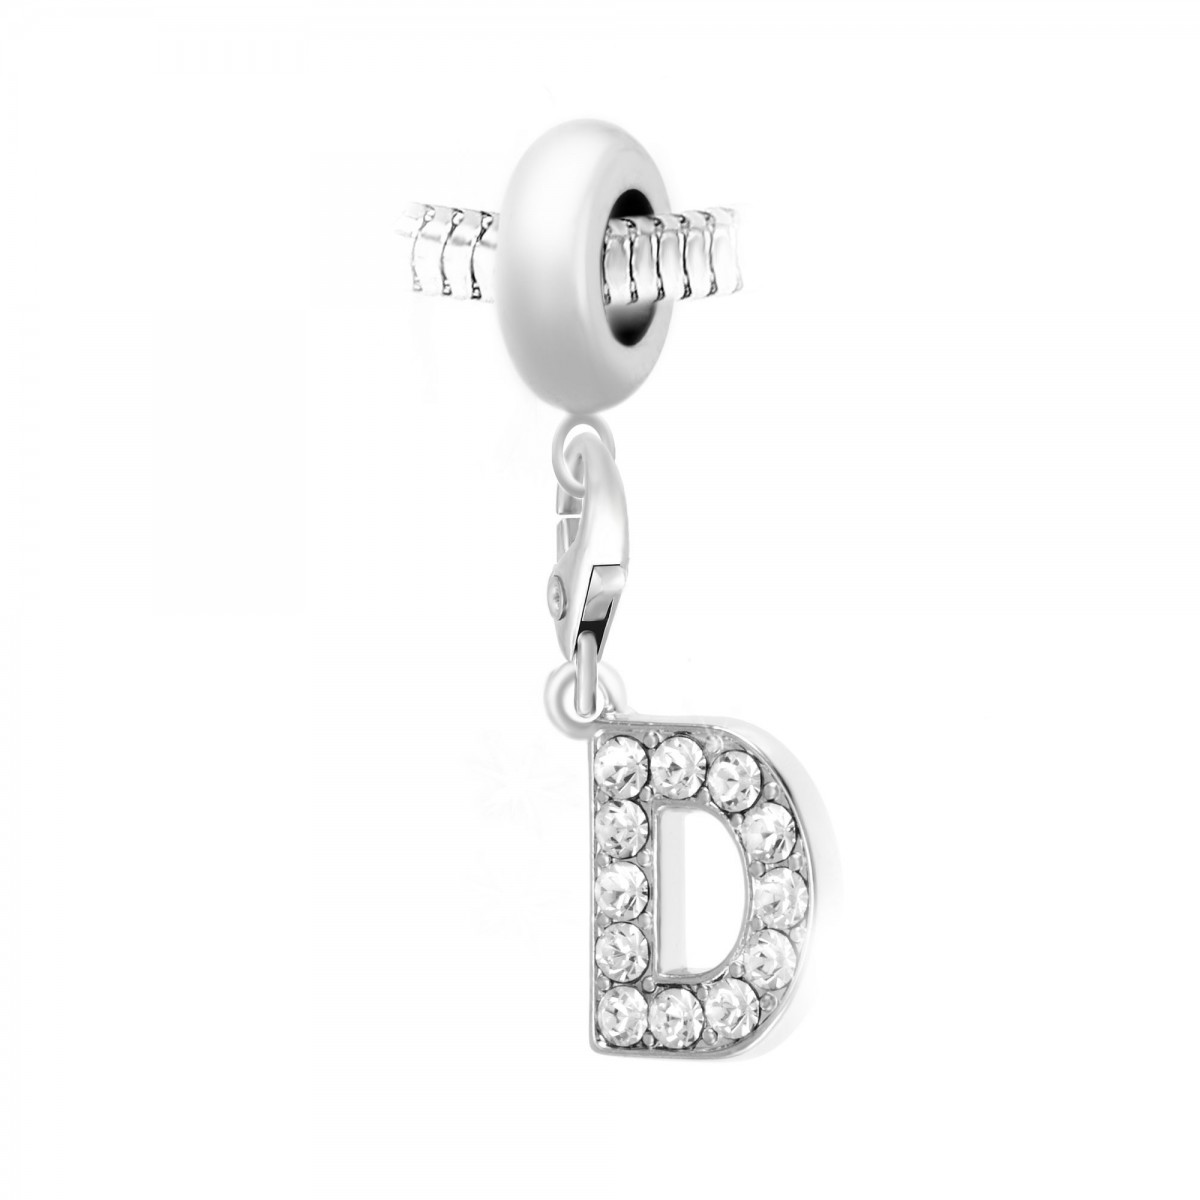 Charm perle So Charm en acier avec pendentif lettre D made with crystal from Swarovski